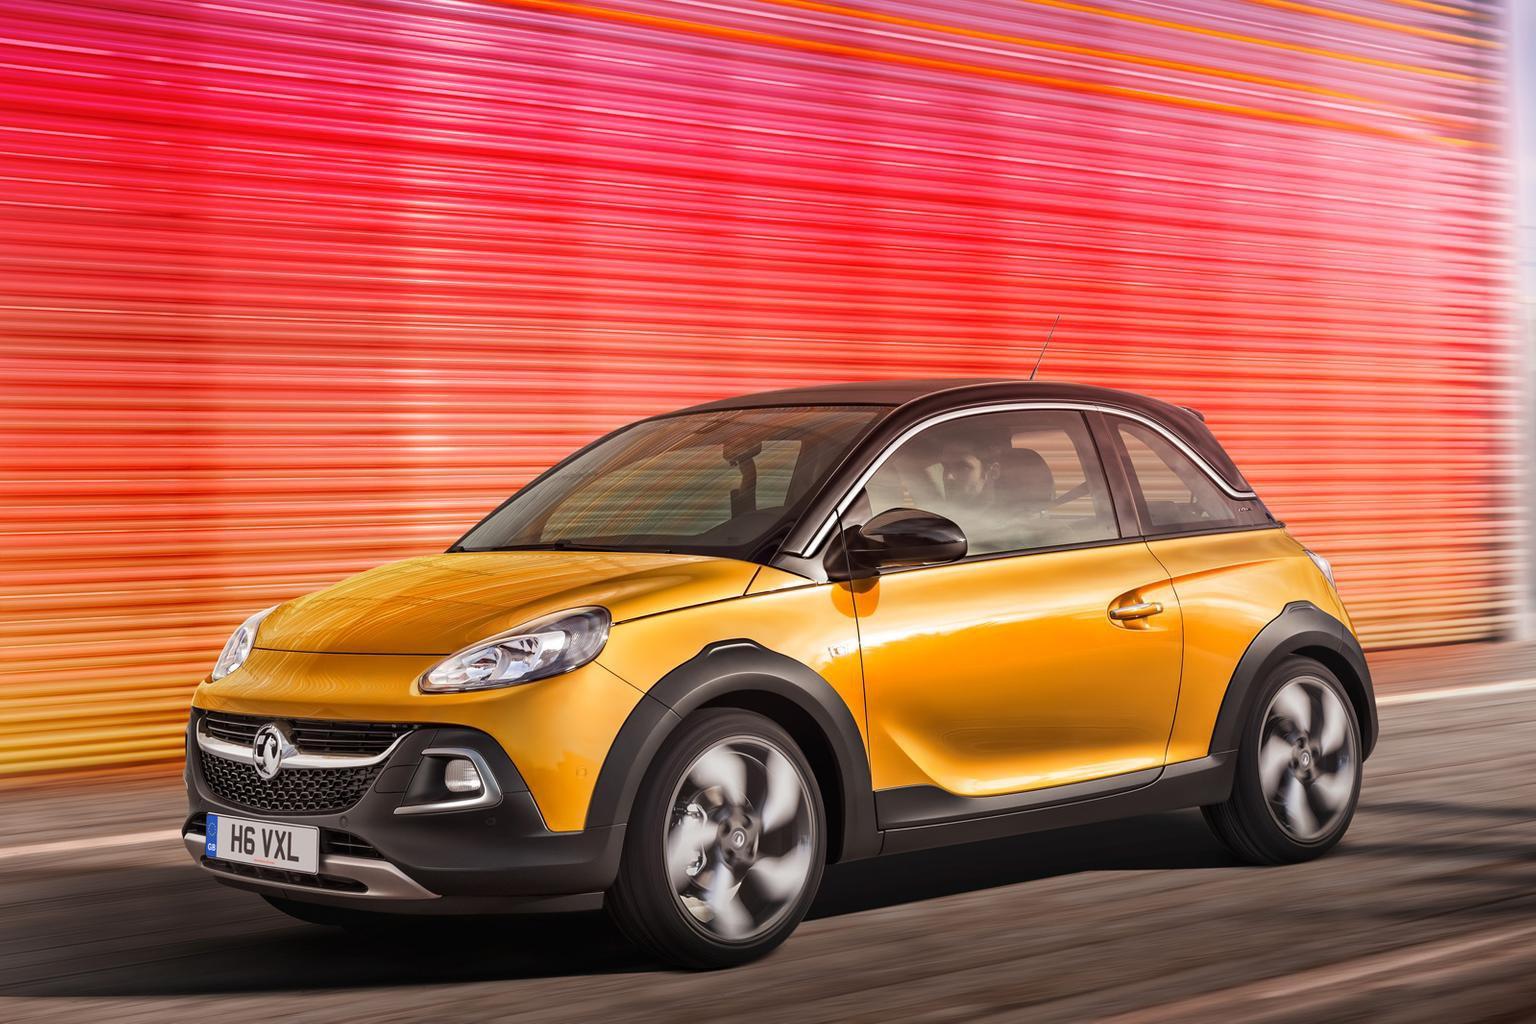 Vauxhall's three-cylinder engine family 'will set new benchmark'